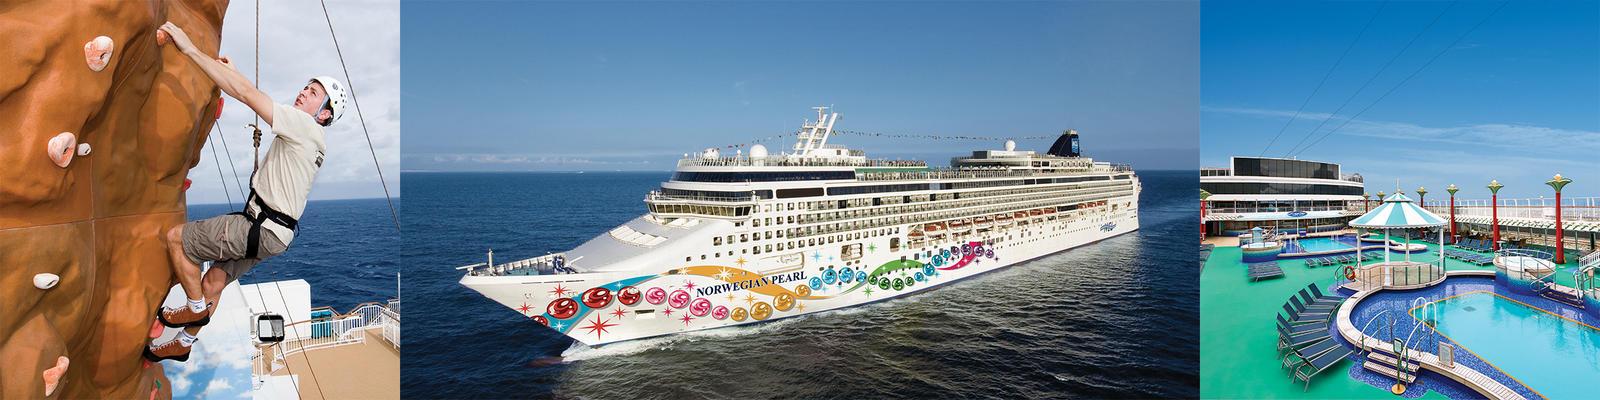 Norwegian Pearl Cruise Ship Review Photos Departure Ports On - Norwegian pearl cruise ship